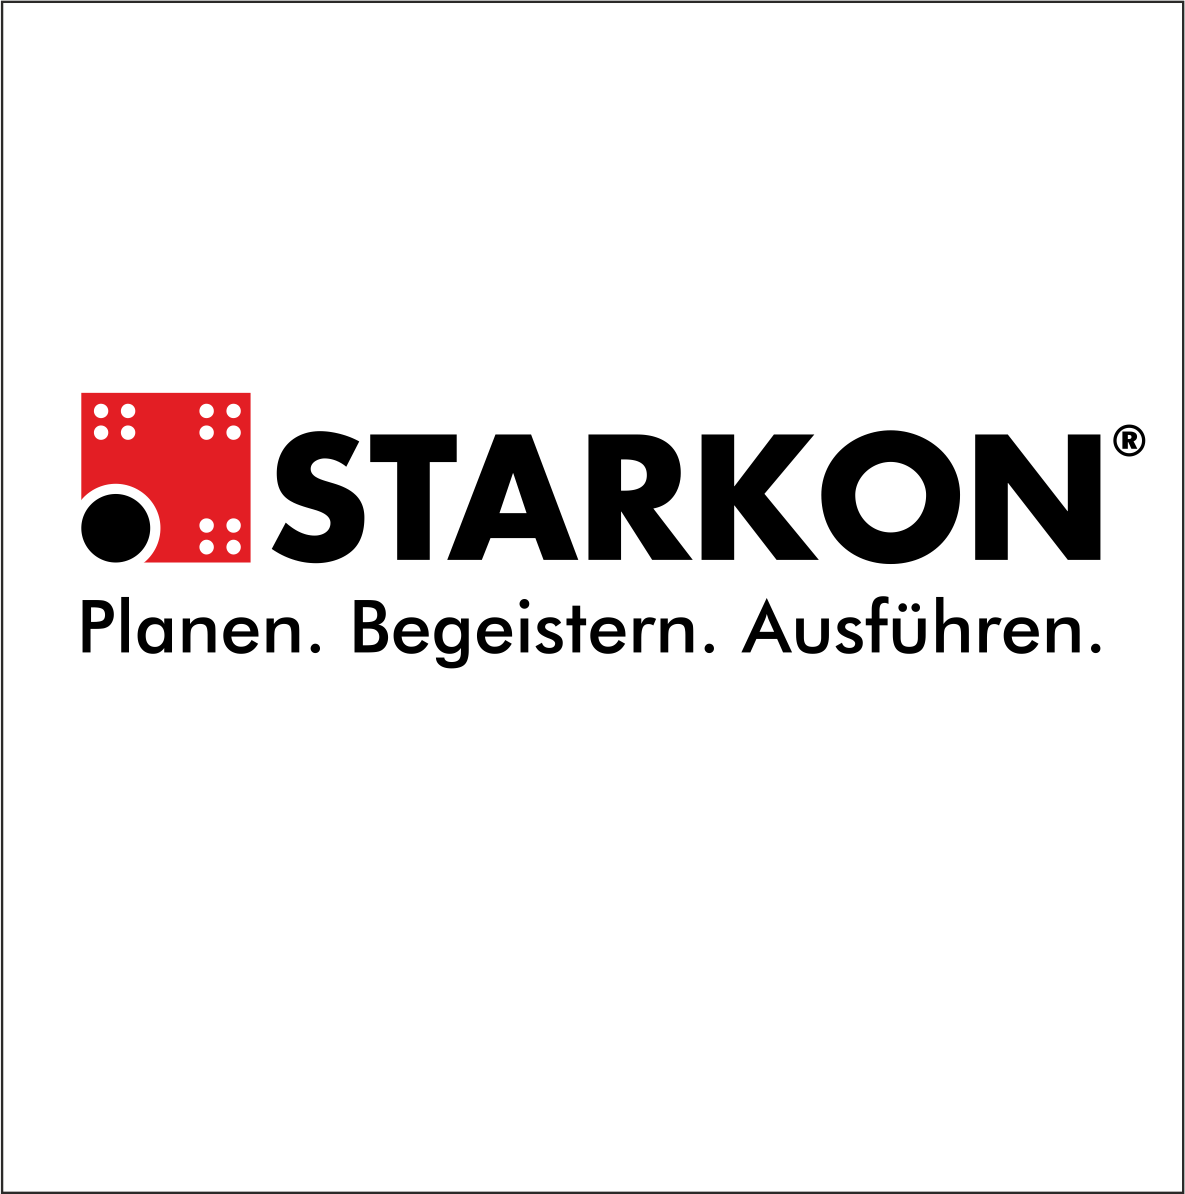 Starkon